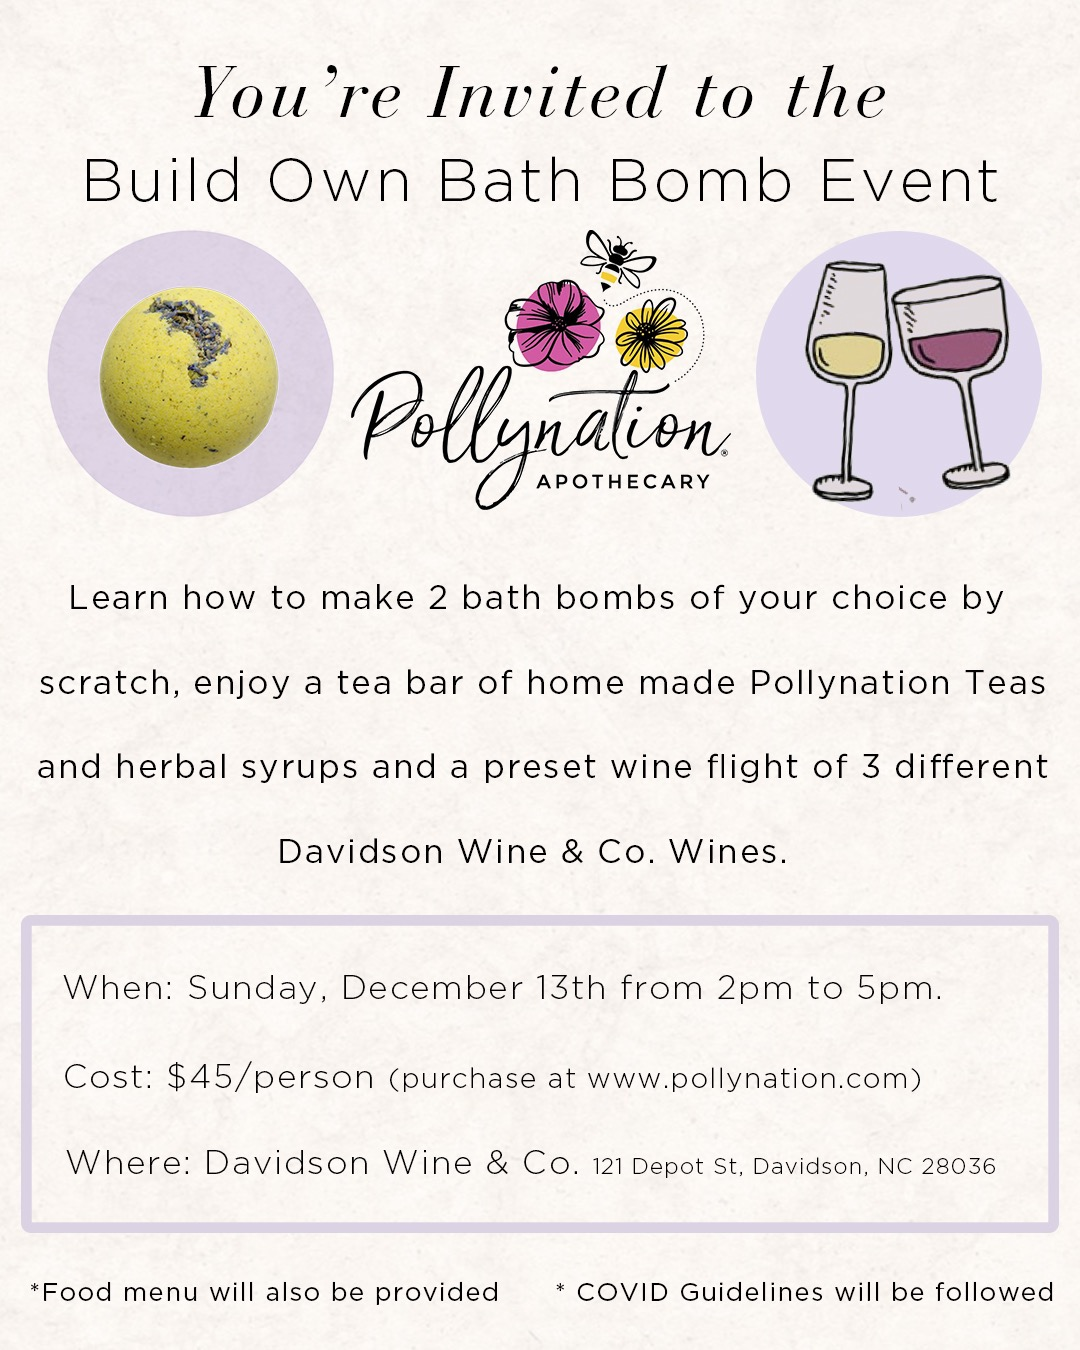 Build Own Bath Bomb Event